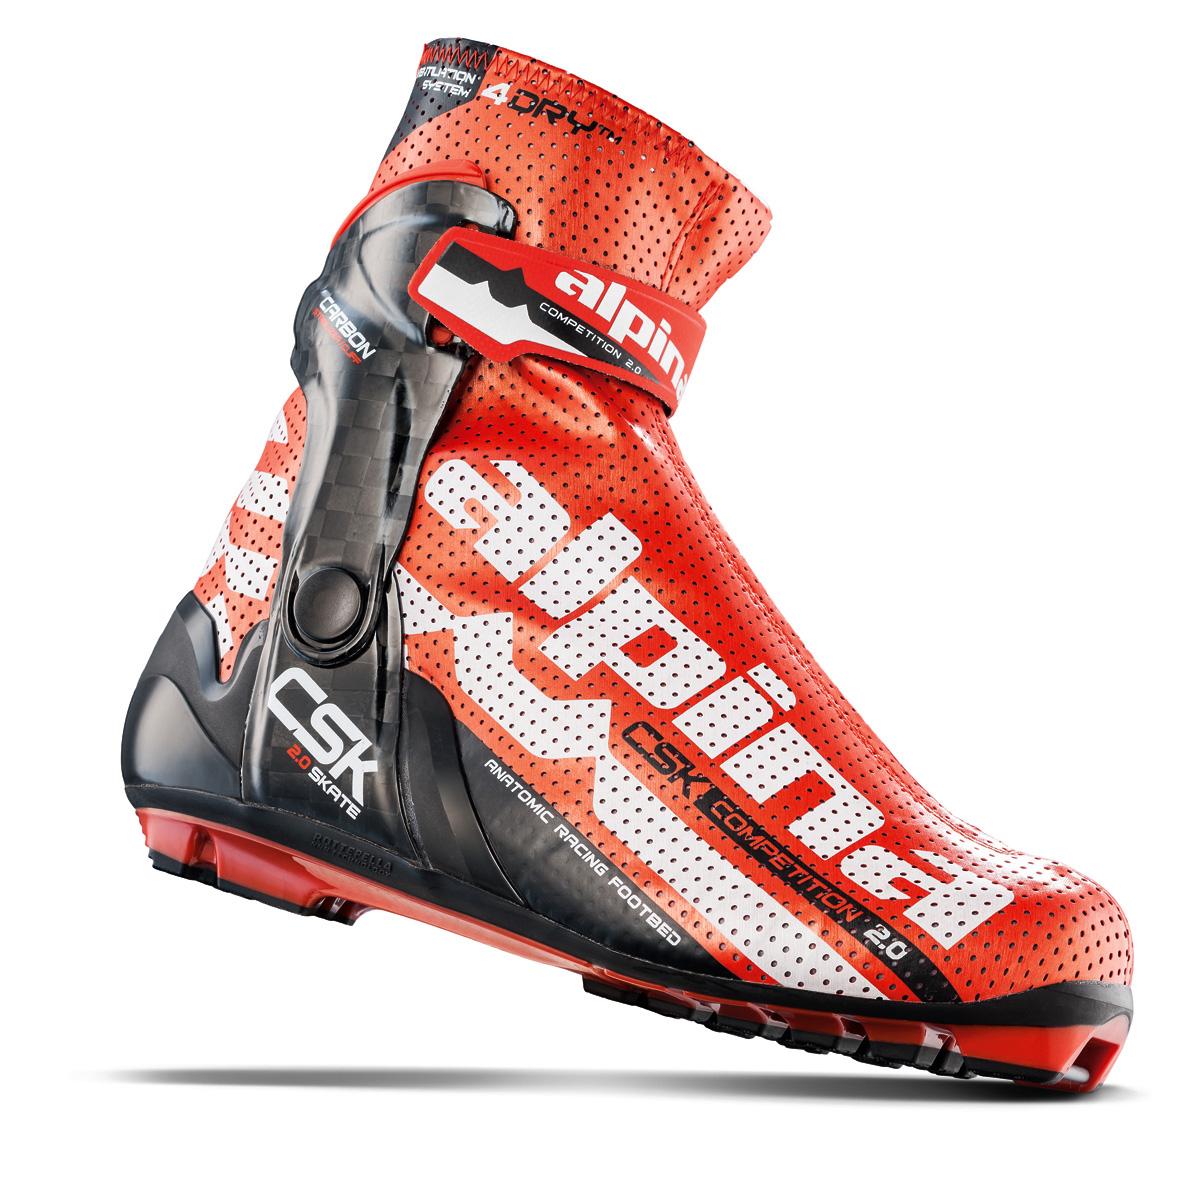 Běžecké boty Alpina CSK 2018 2019  d854b5c35f